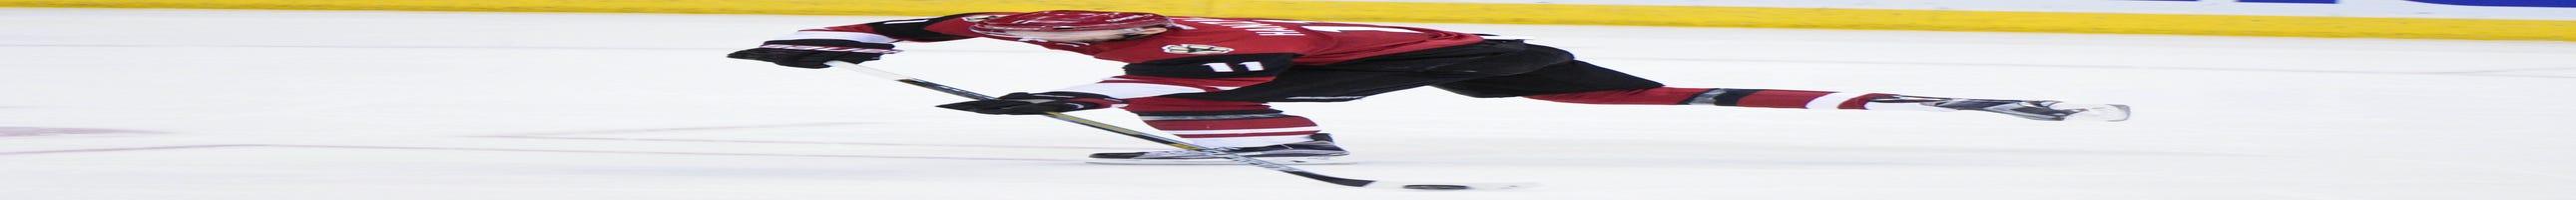 Martin Hanzal: good start slowed by injuries